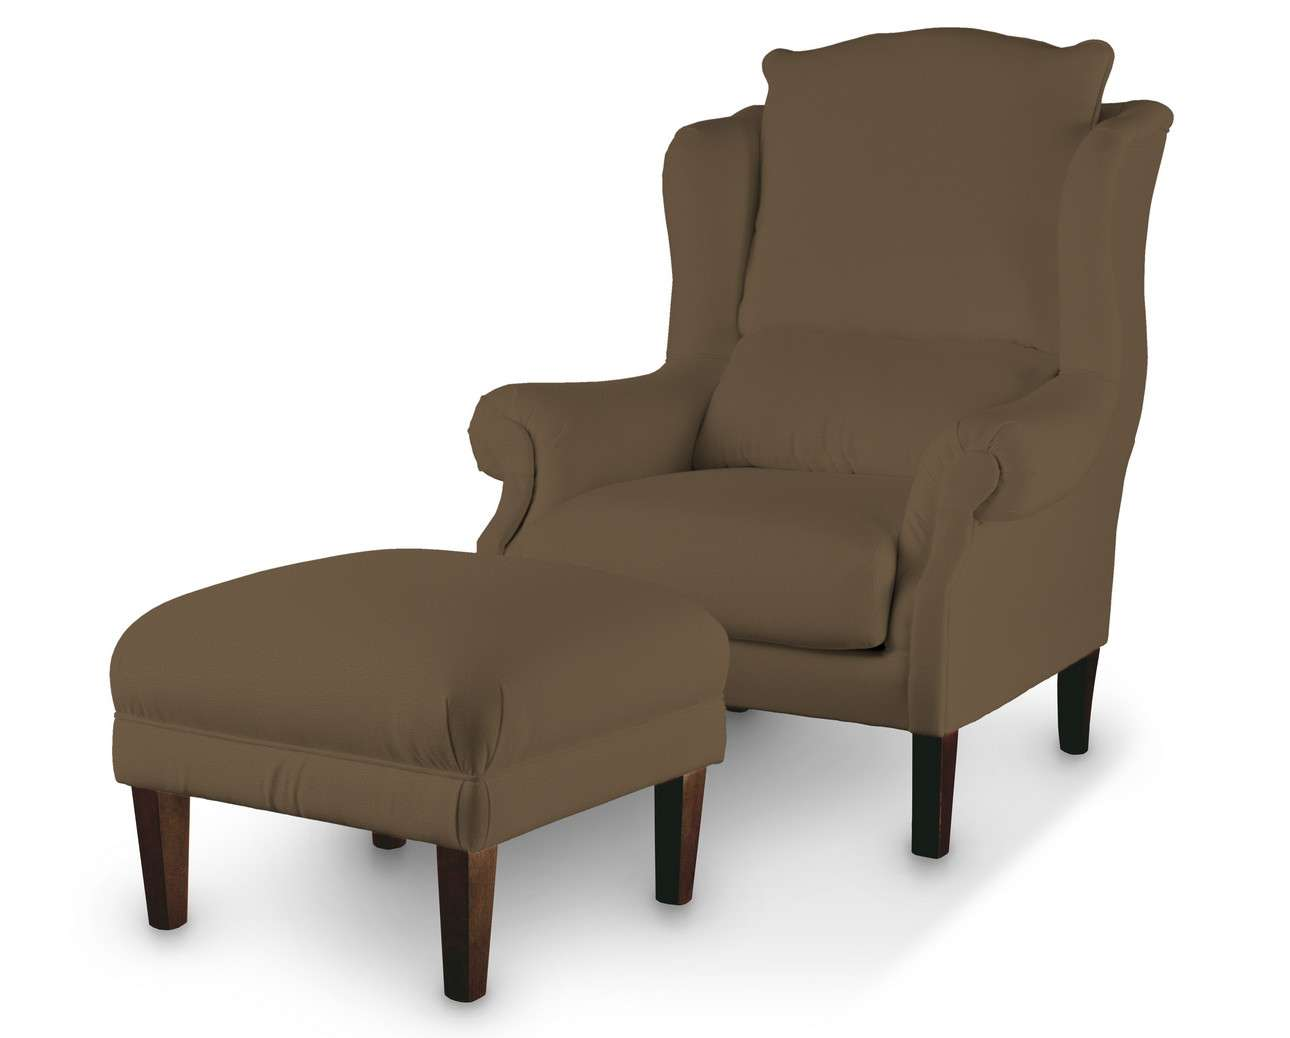 Podnóżek do fotela w kolekcji Living, tkanina: 160-94